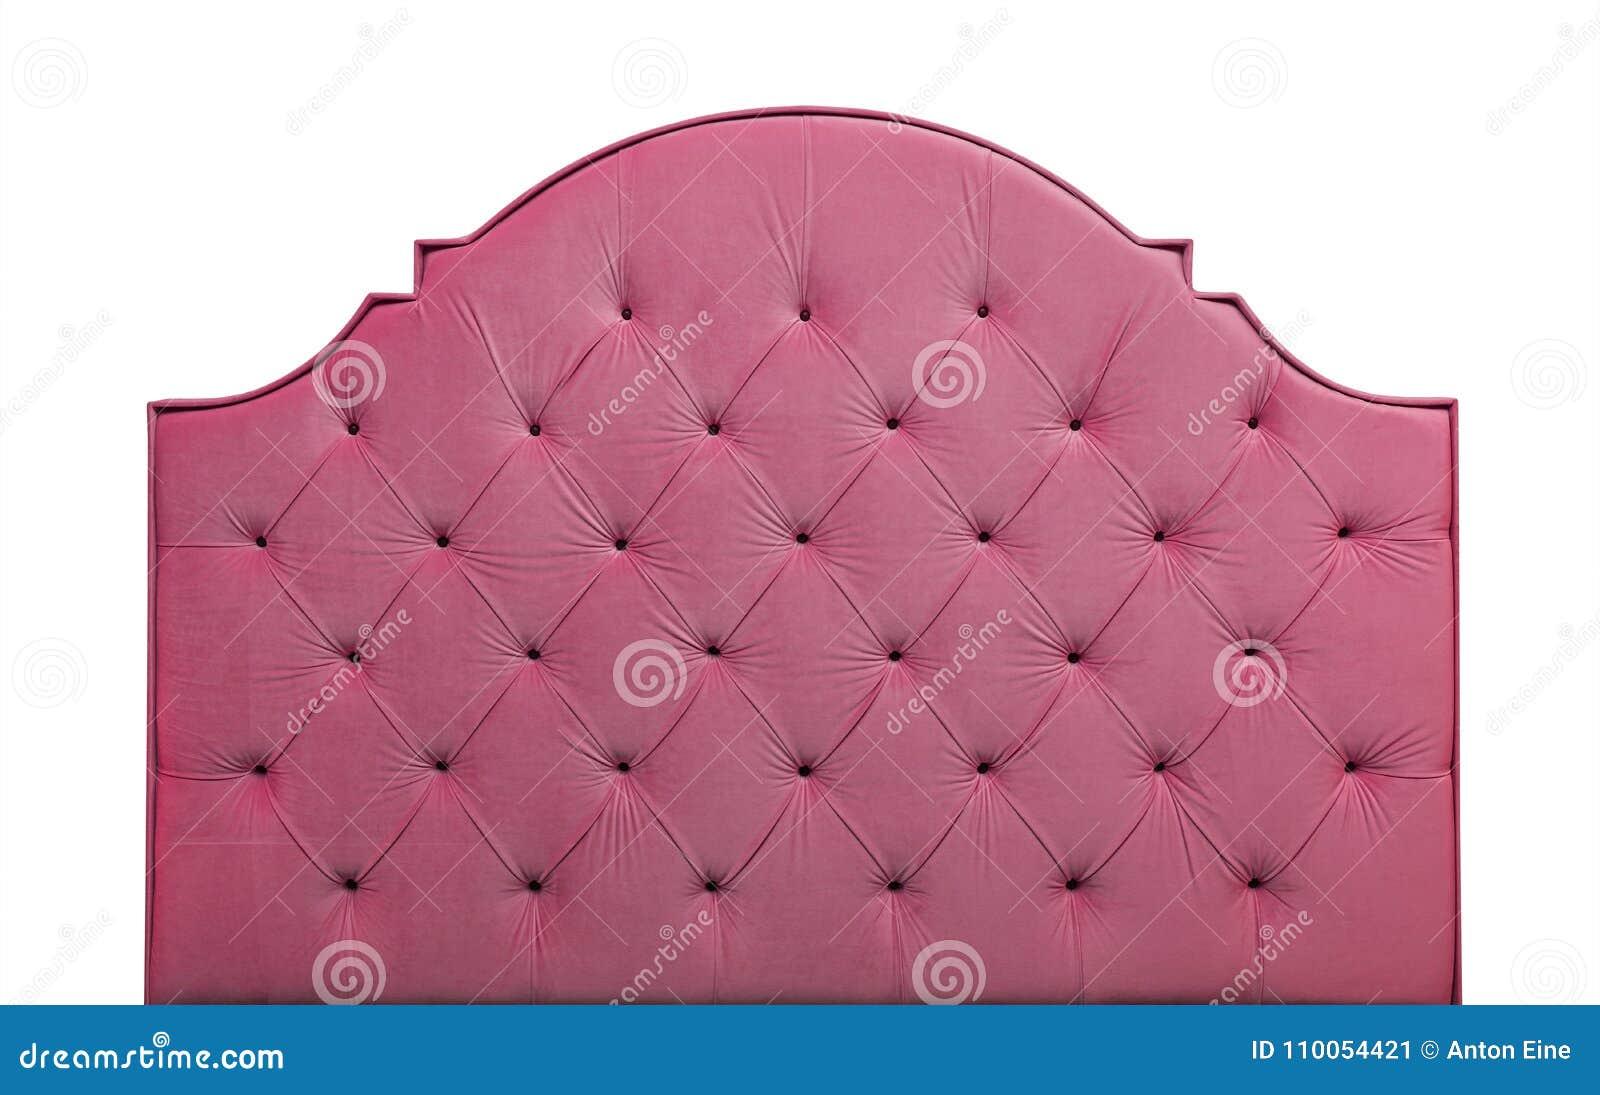 Cabeceira cor-de-rosa da cama de veludo isolada no branco